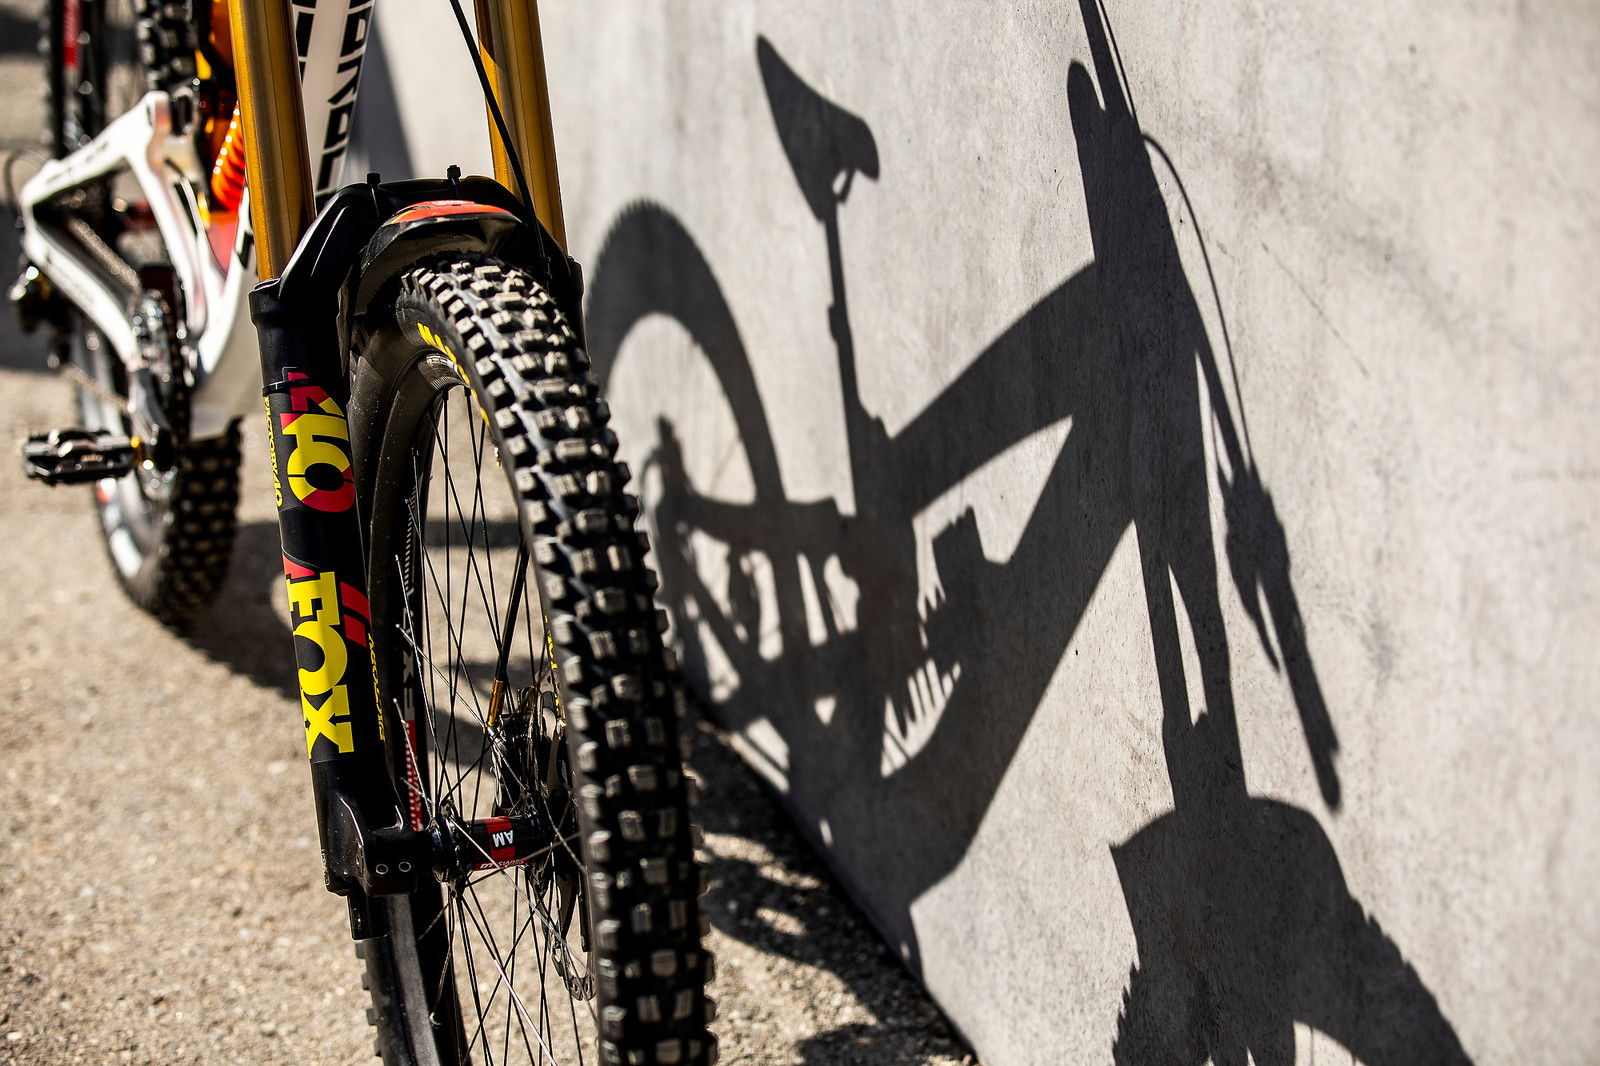 FOX 40 - WORLD CHAMPS BIKE - Alex Marin's Saracen Myst - Mountain Biking Pictures - Vital MTB